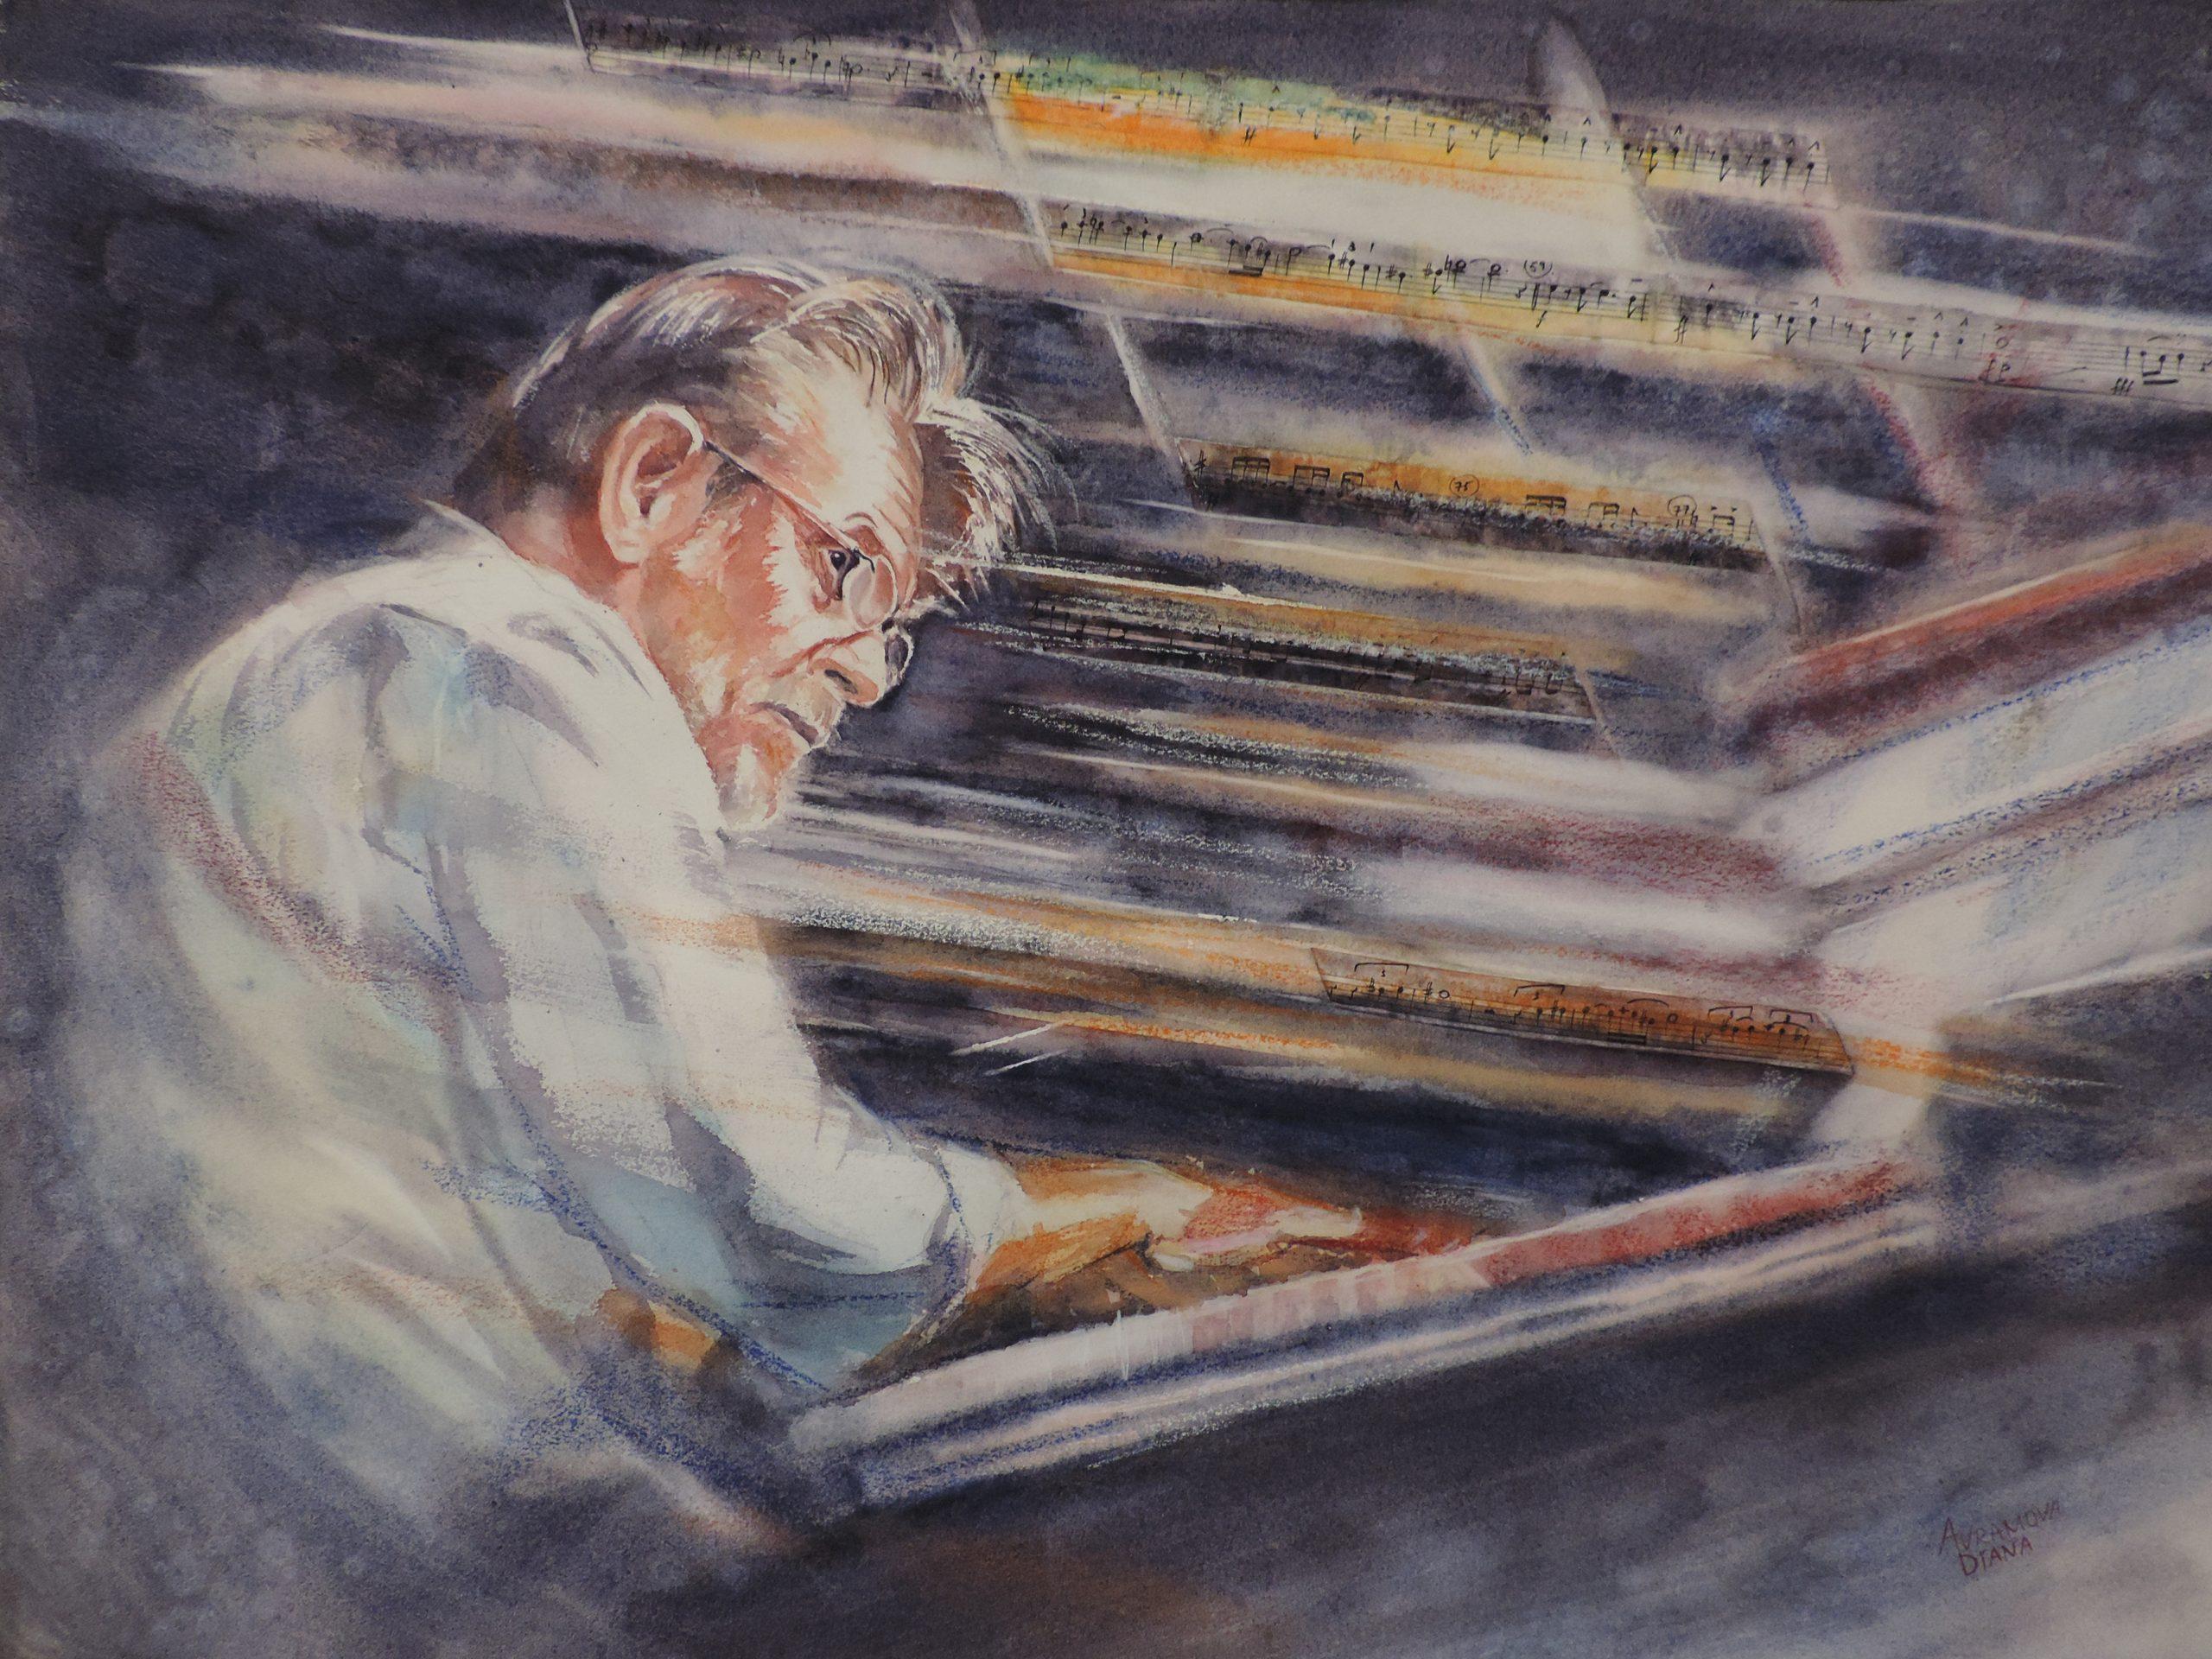 Piano Impressie